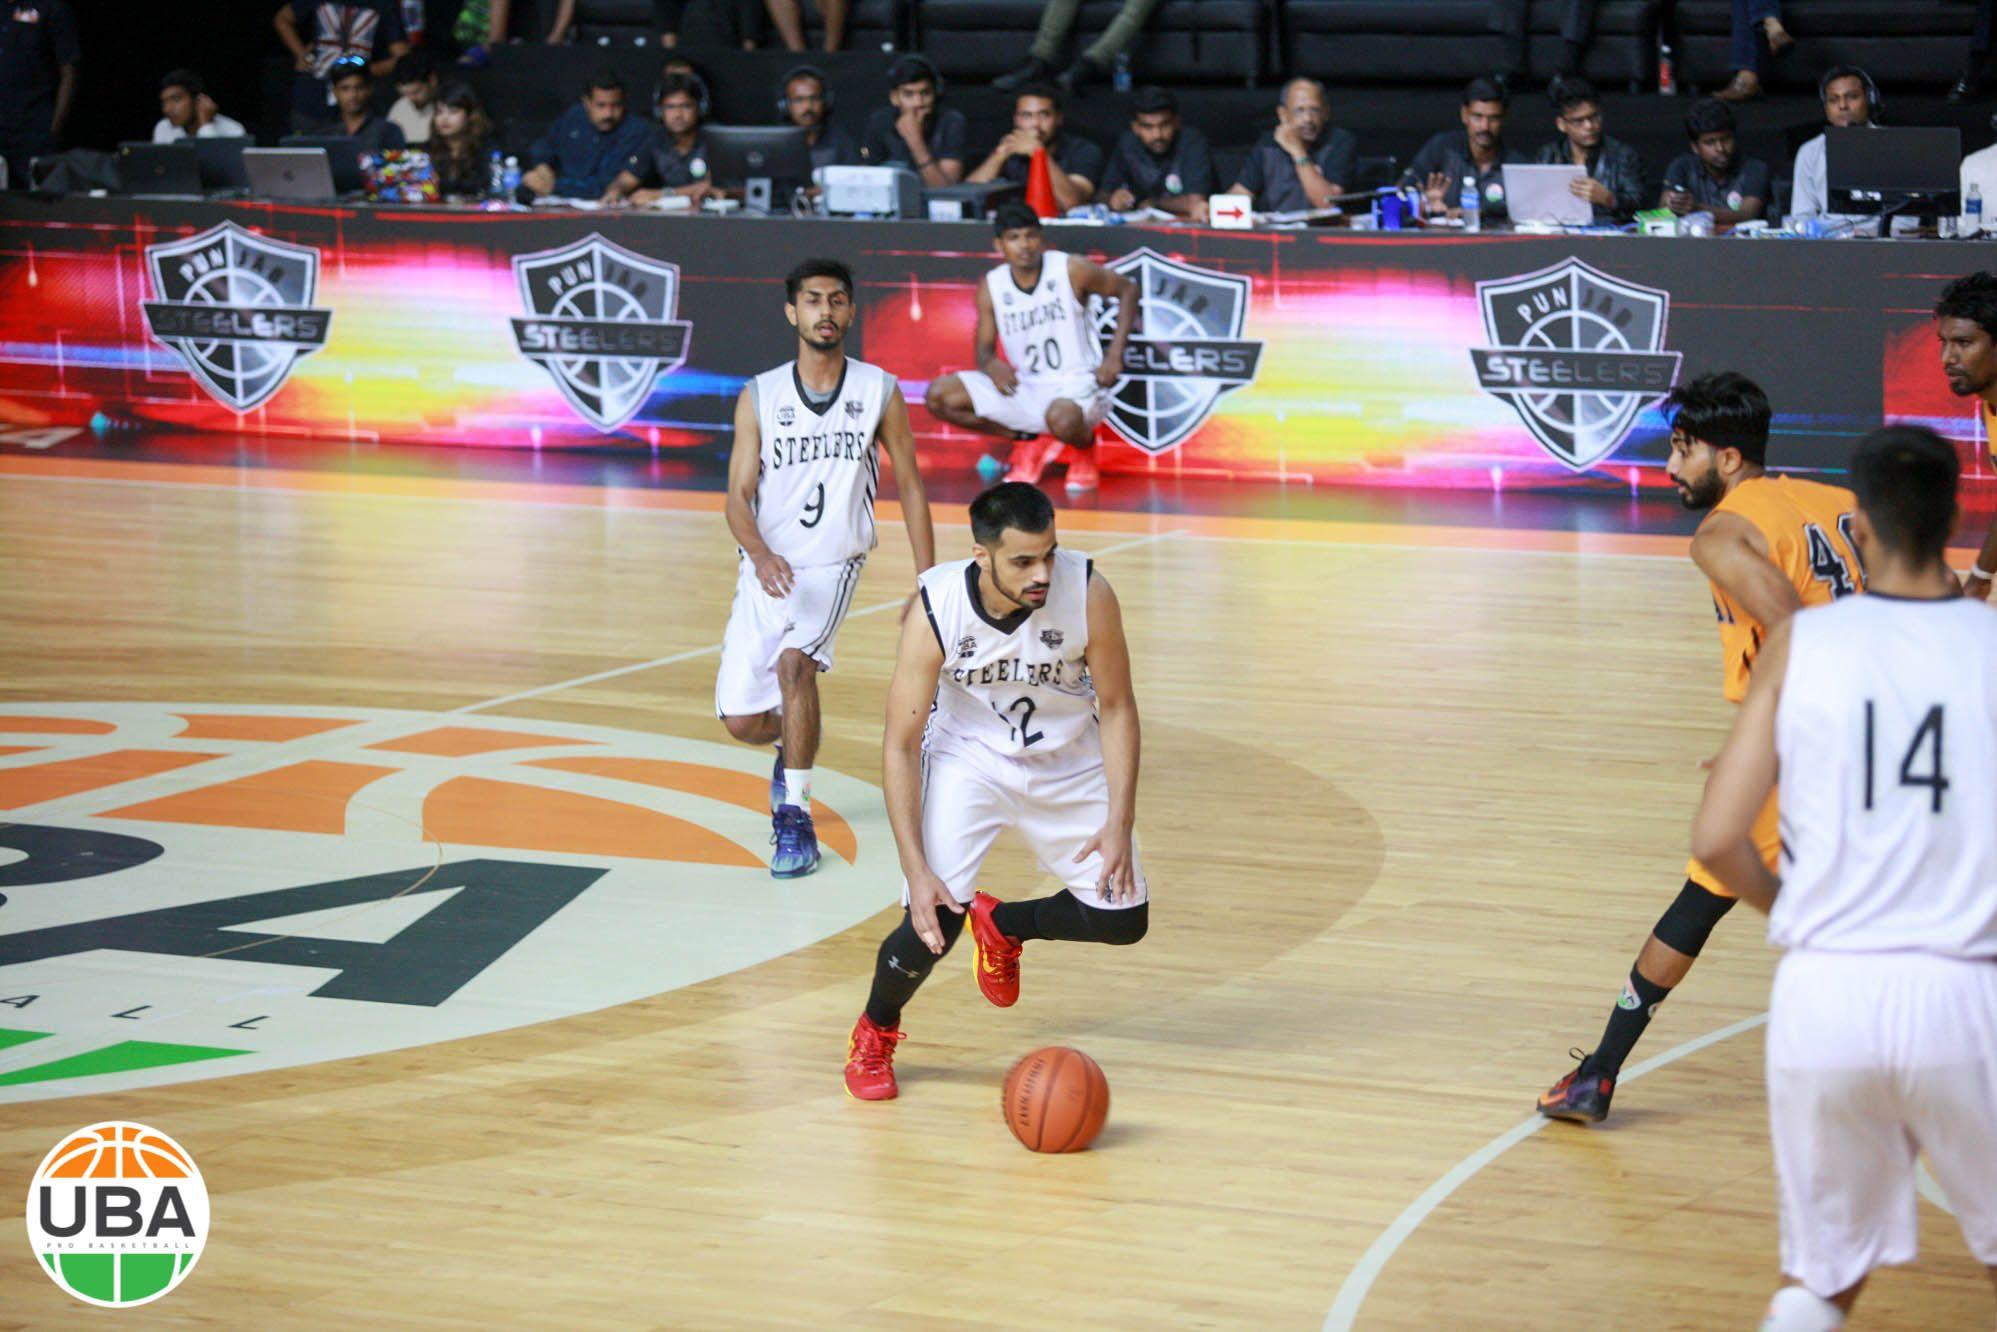 Taj Looks To Make Something Happen Vs Mumbai Challengers Ubaindia Ubaseason4 Basketball Teams Challenger Uba